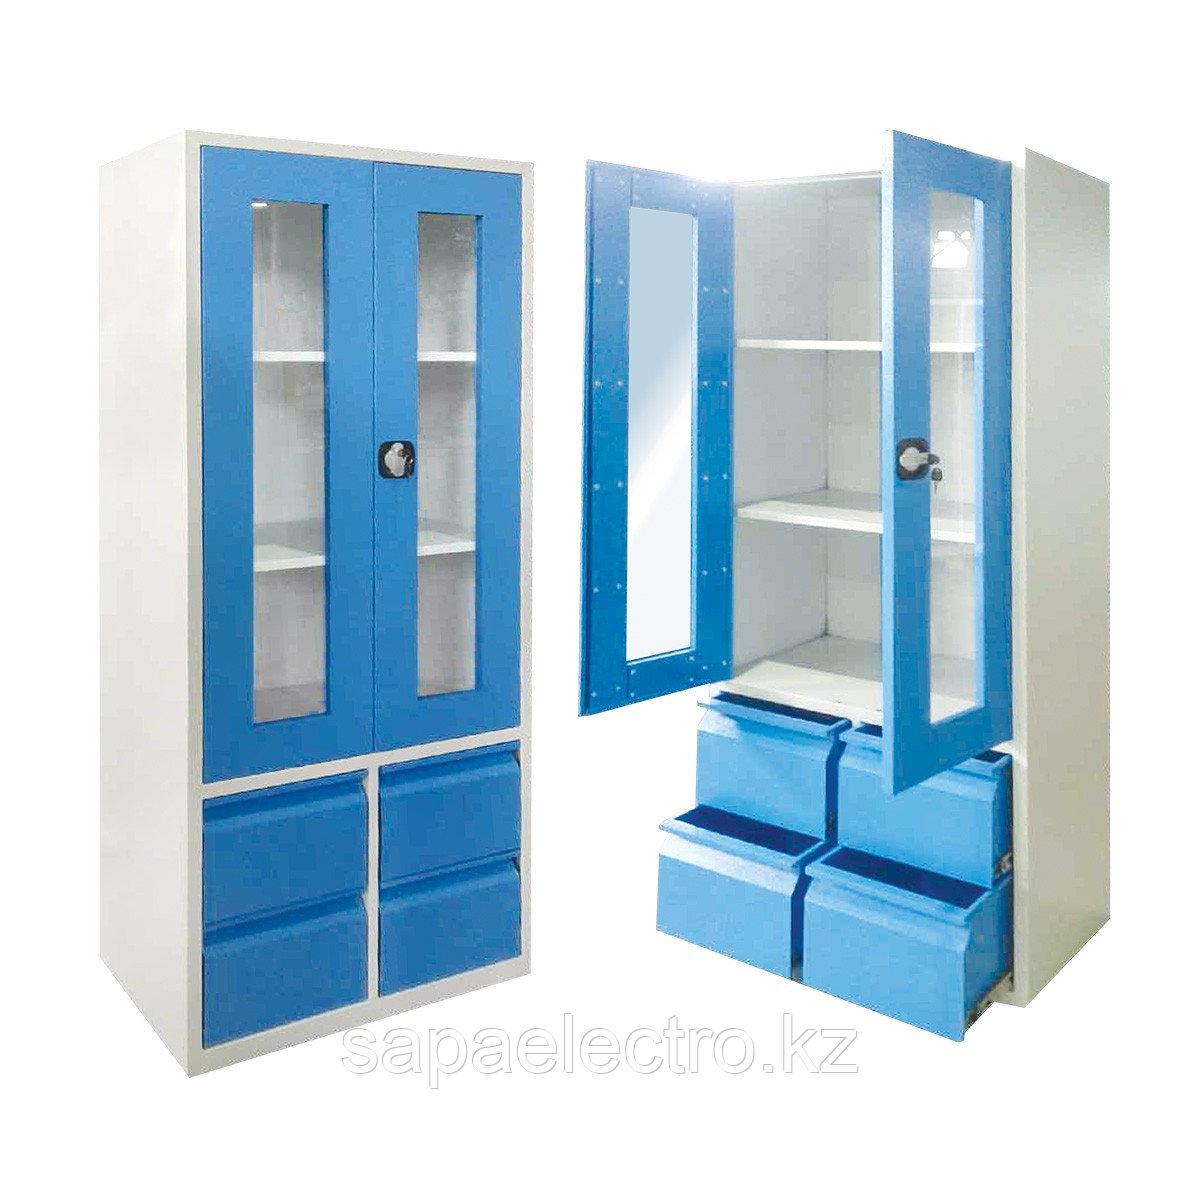 Металл. Шкаф для преподавателей  800x450x1950 MGL